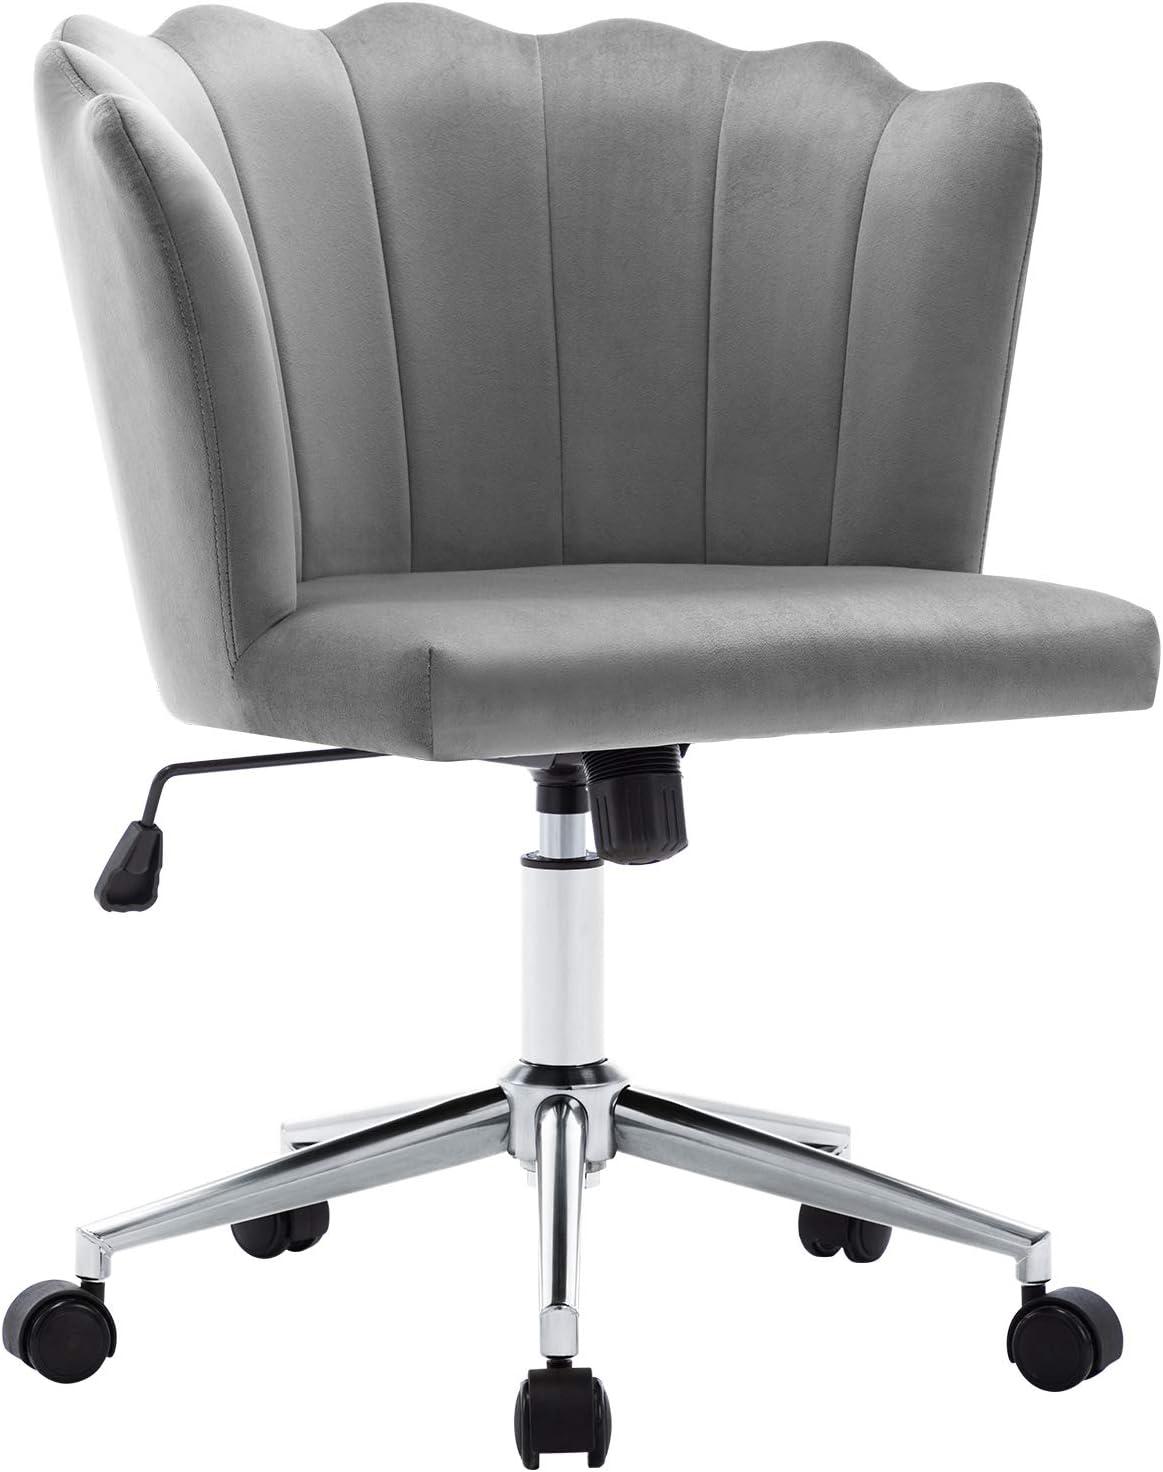 Duhome Modern Home Office Chair Washington Mall Velvet Ranking TOP15 Grey Ad Desk Fabric